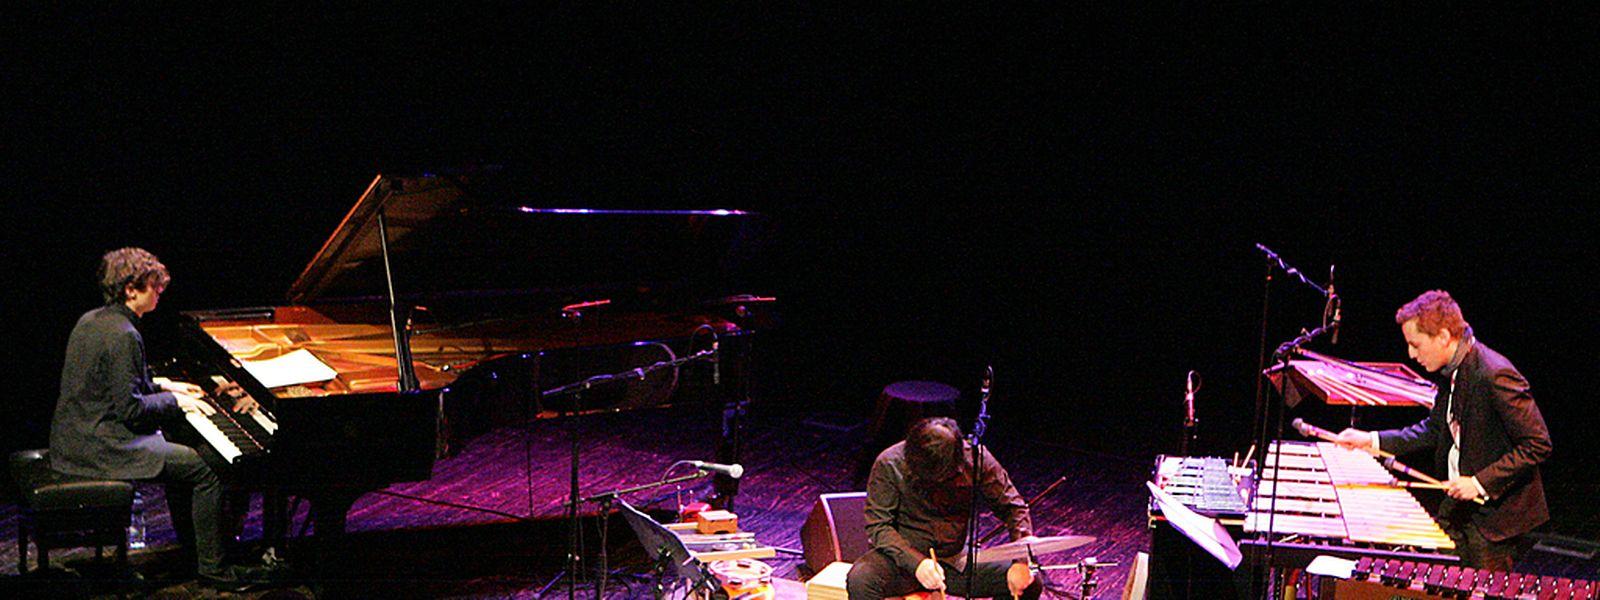 Das Khalifé-Schumacher-Tristano-Trio.